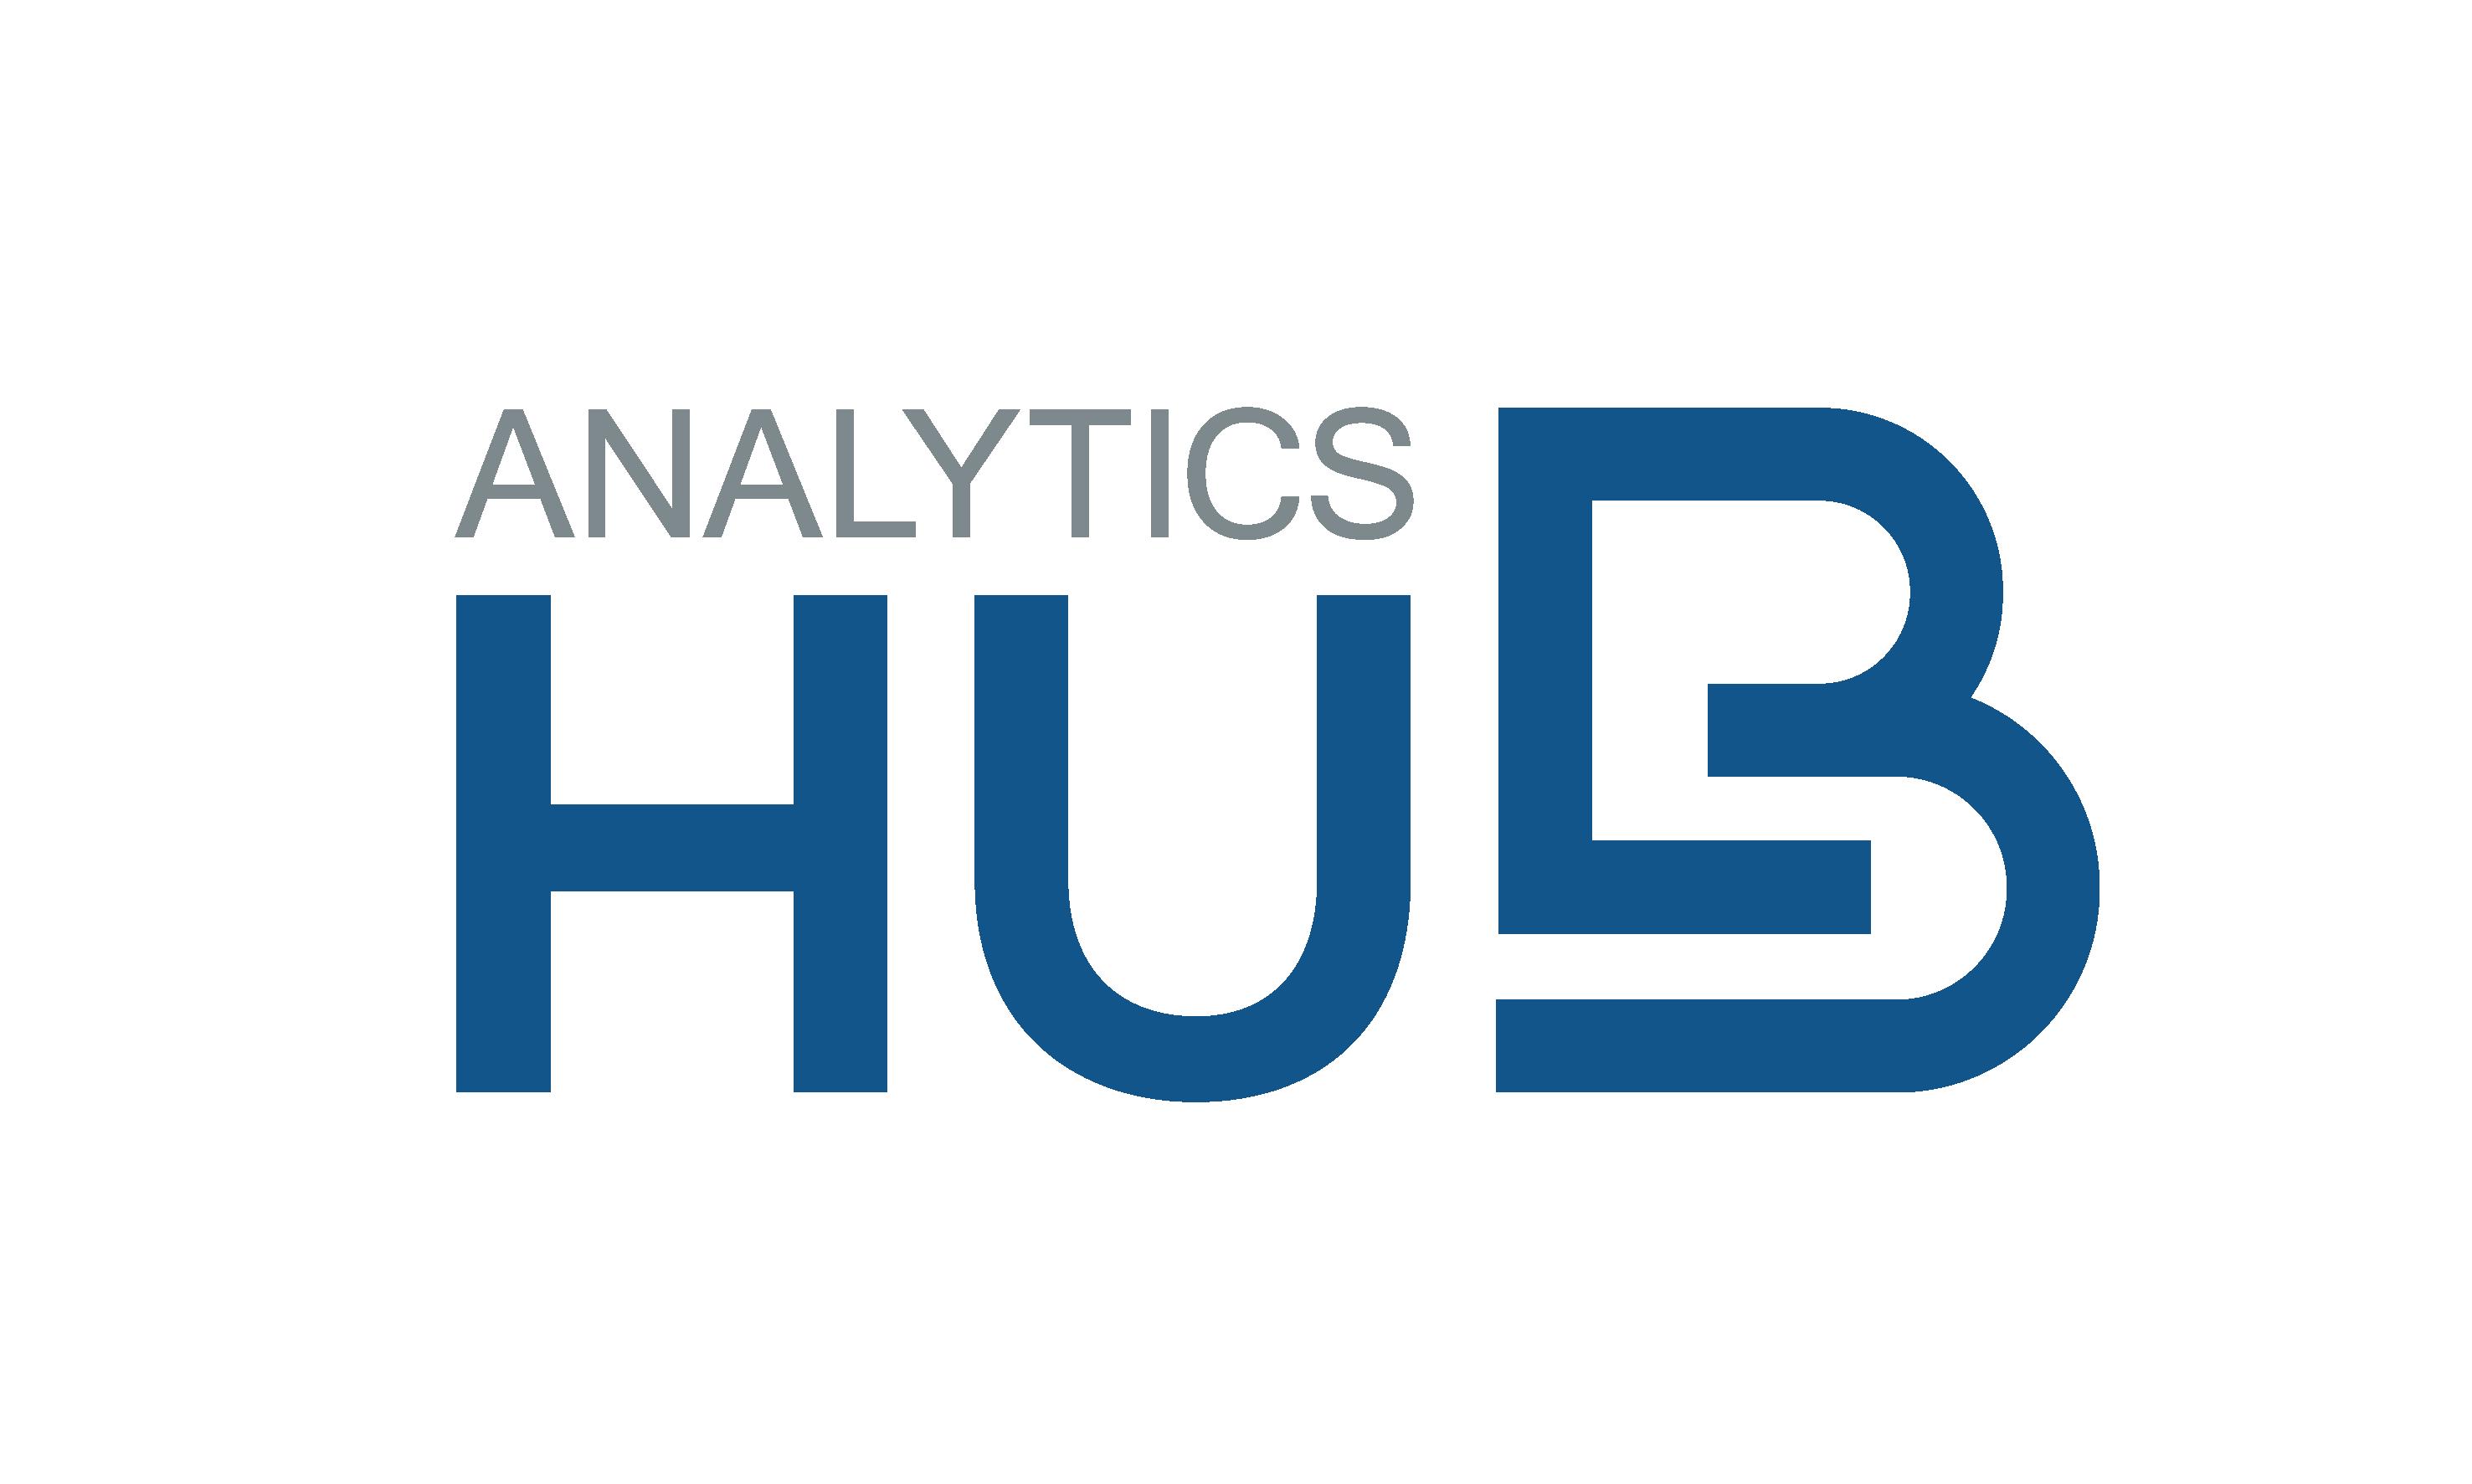 Analytics HUB